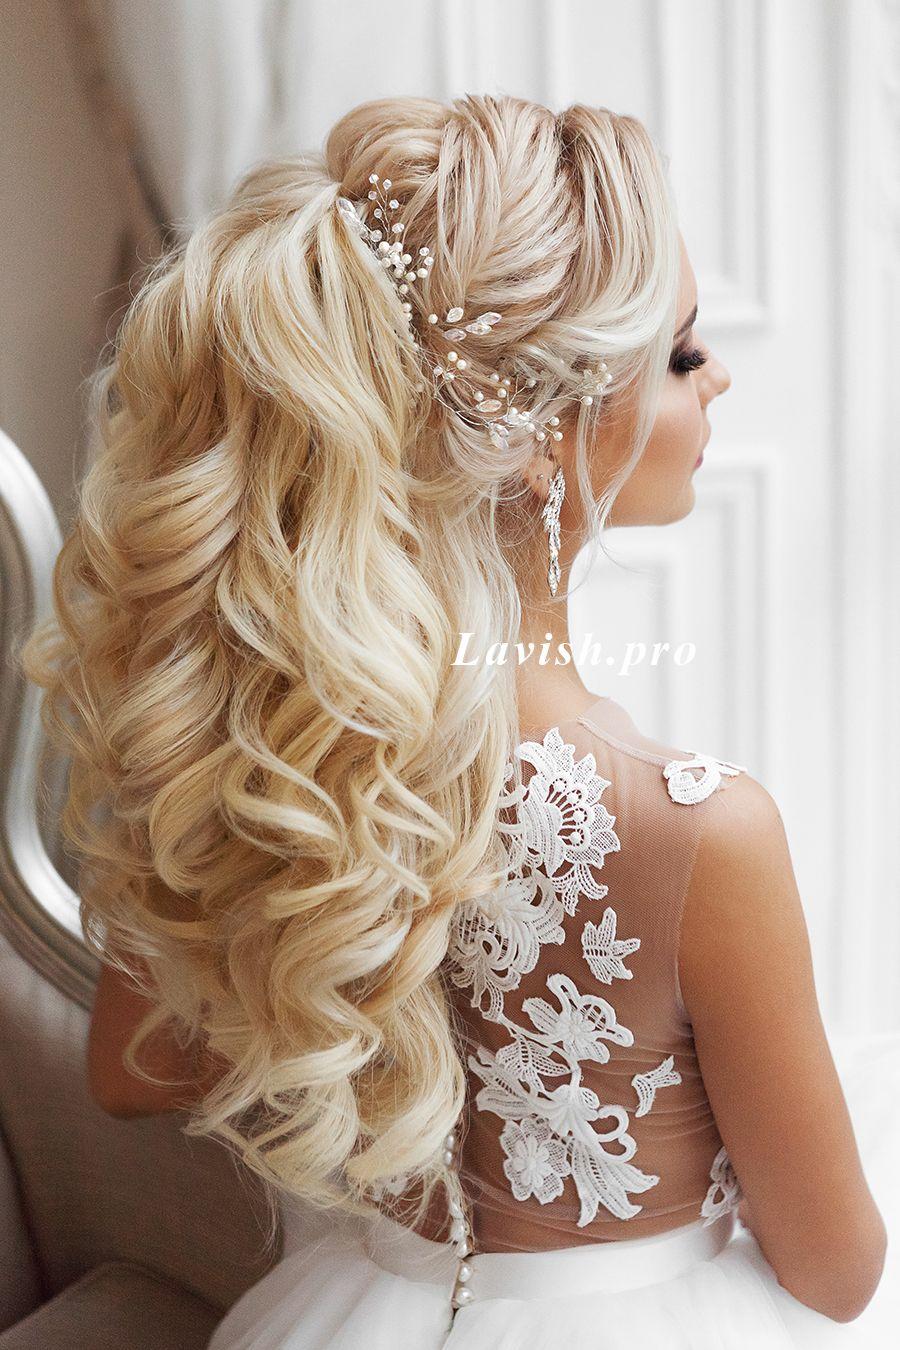 lavish wedding style | all about weddings in 2019 | elegant